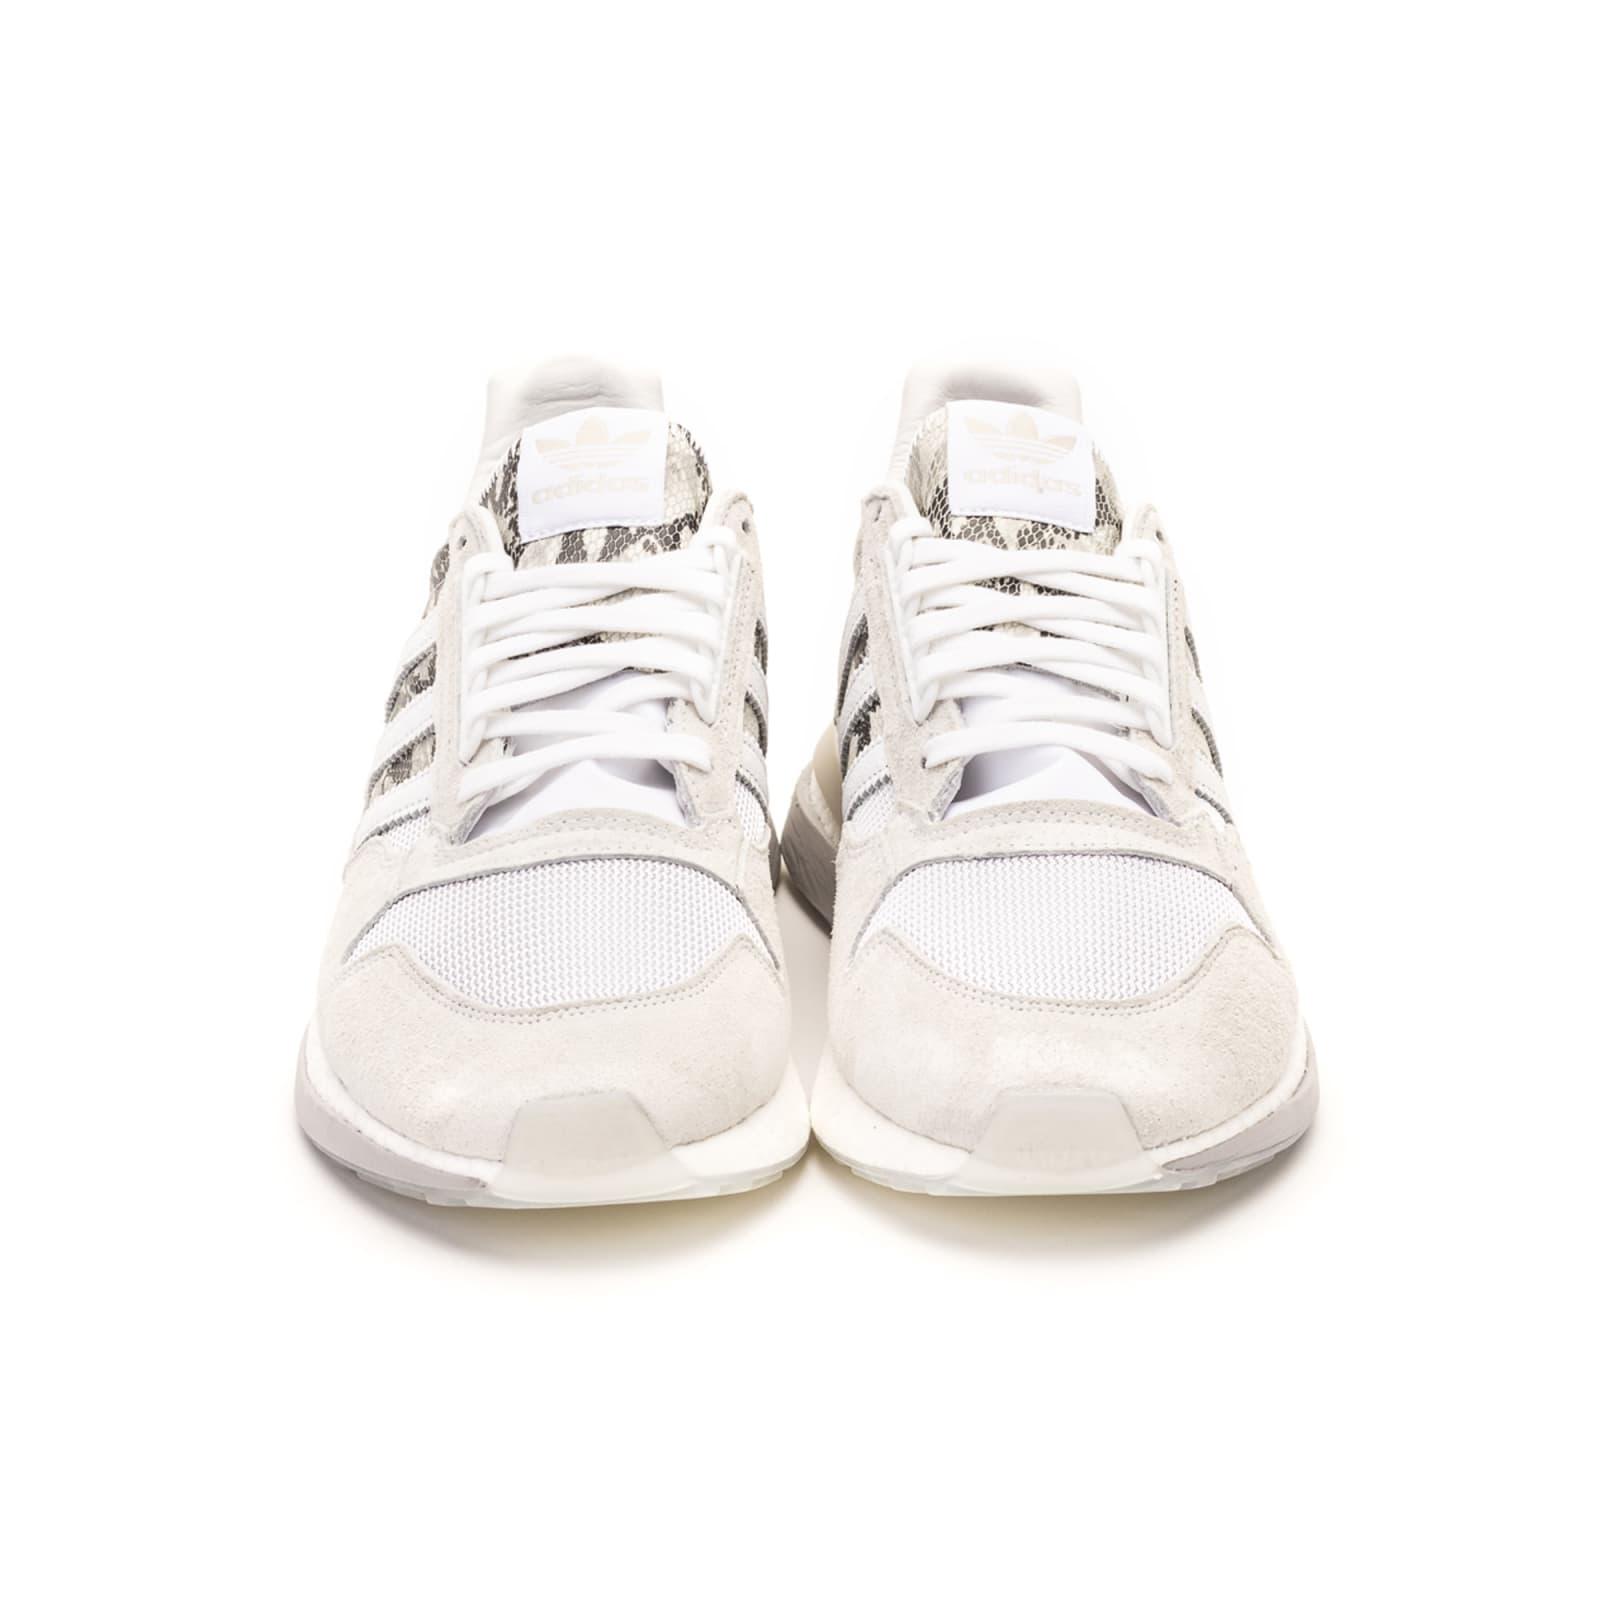 buy popular 4b659 2db95 Adidas Zx 500 Rm Sneakers